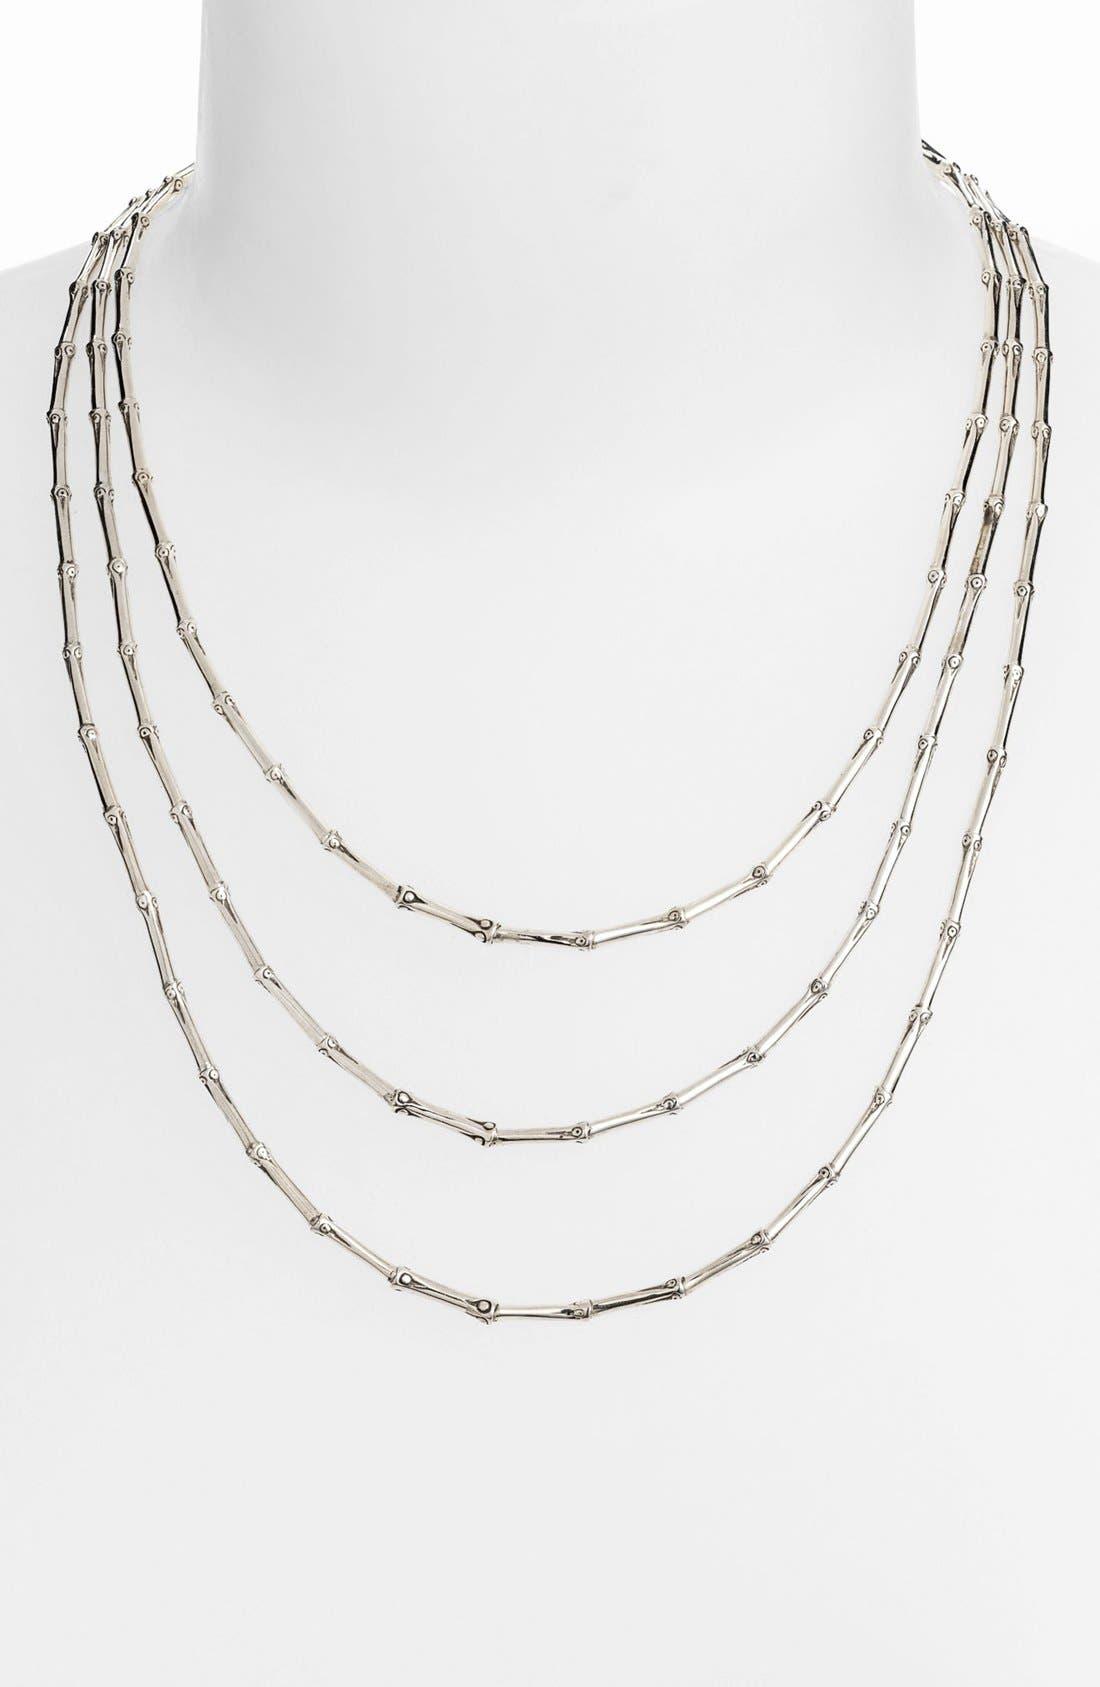 Alternate Image 1 Selected - John Hardy 'Bamboo' Triple Row Necklace